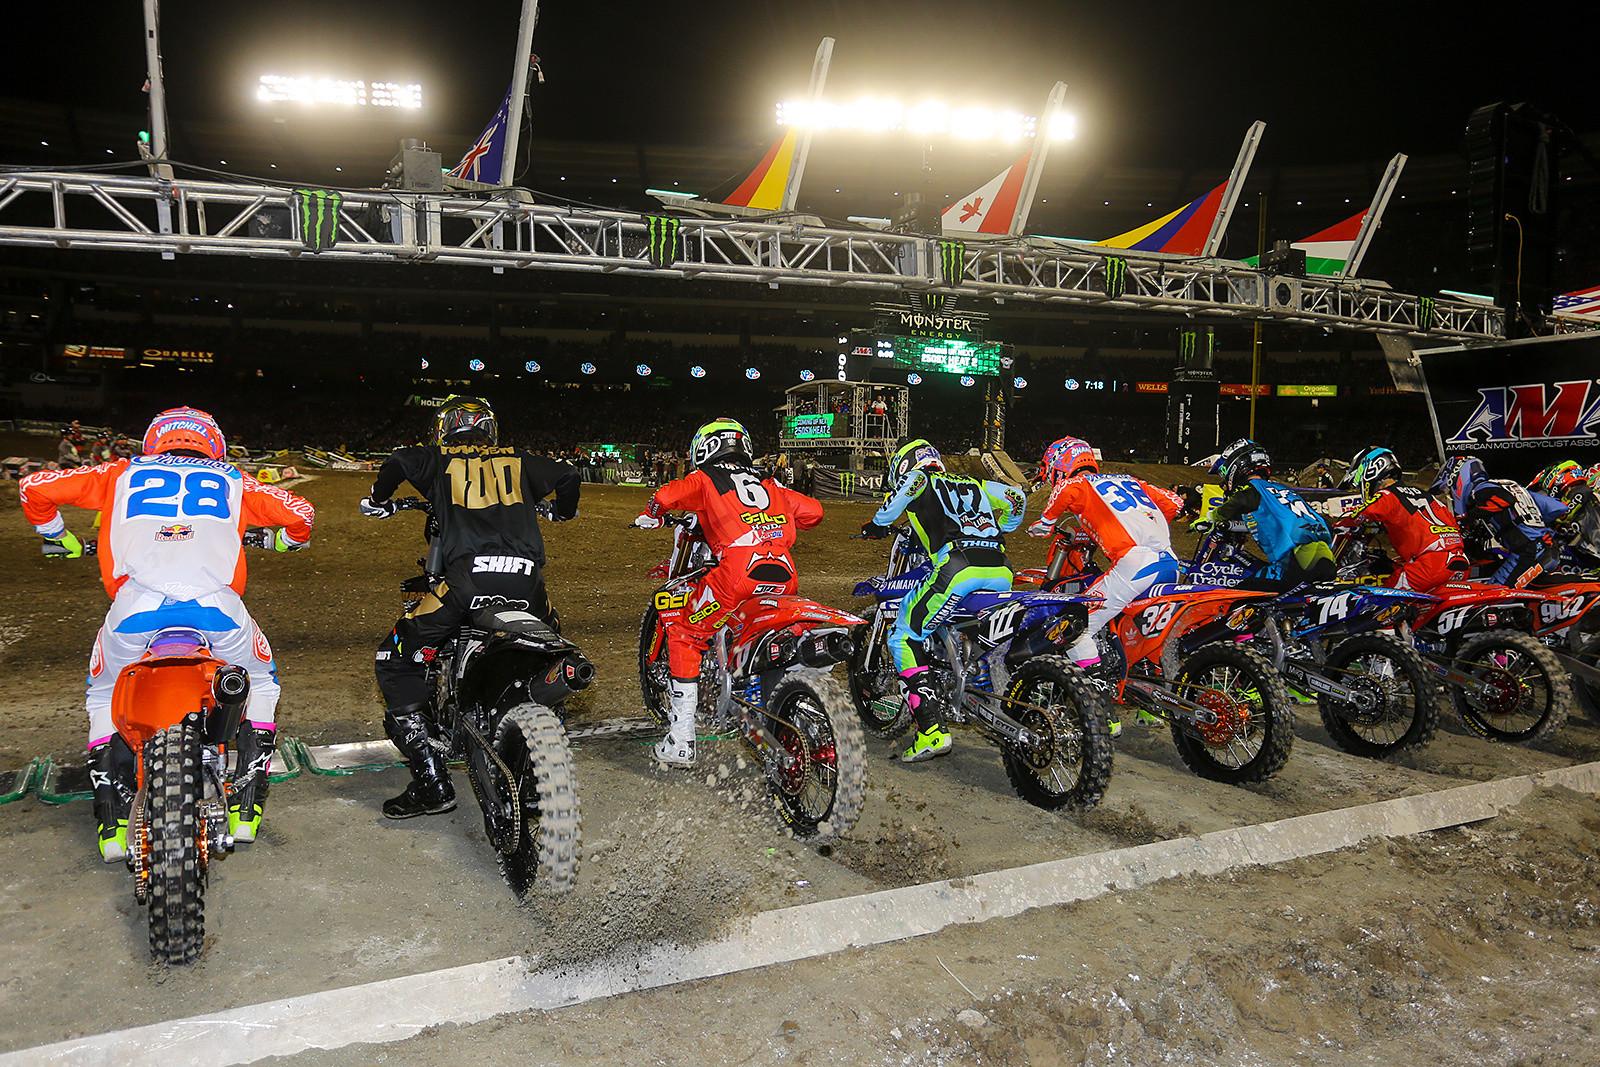 250 heat race two start - Photo Blast: Anaheim 1 - Motocross Pictures - Vital MX